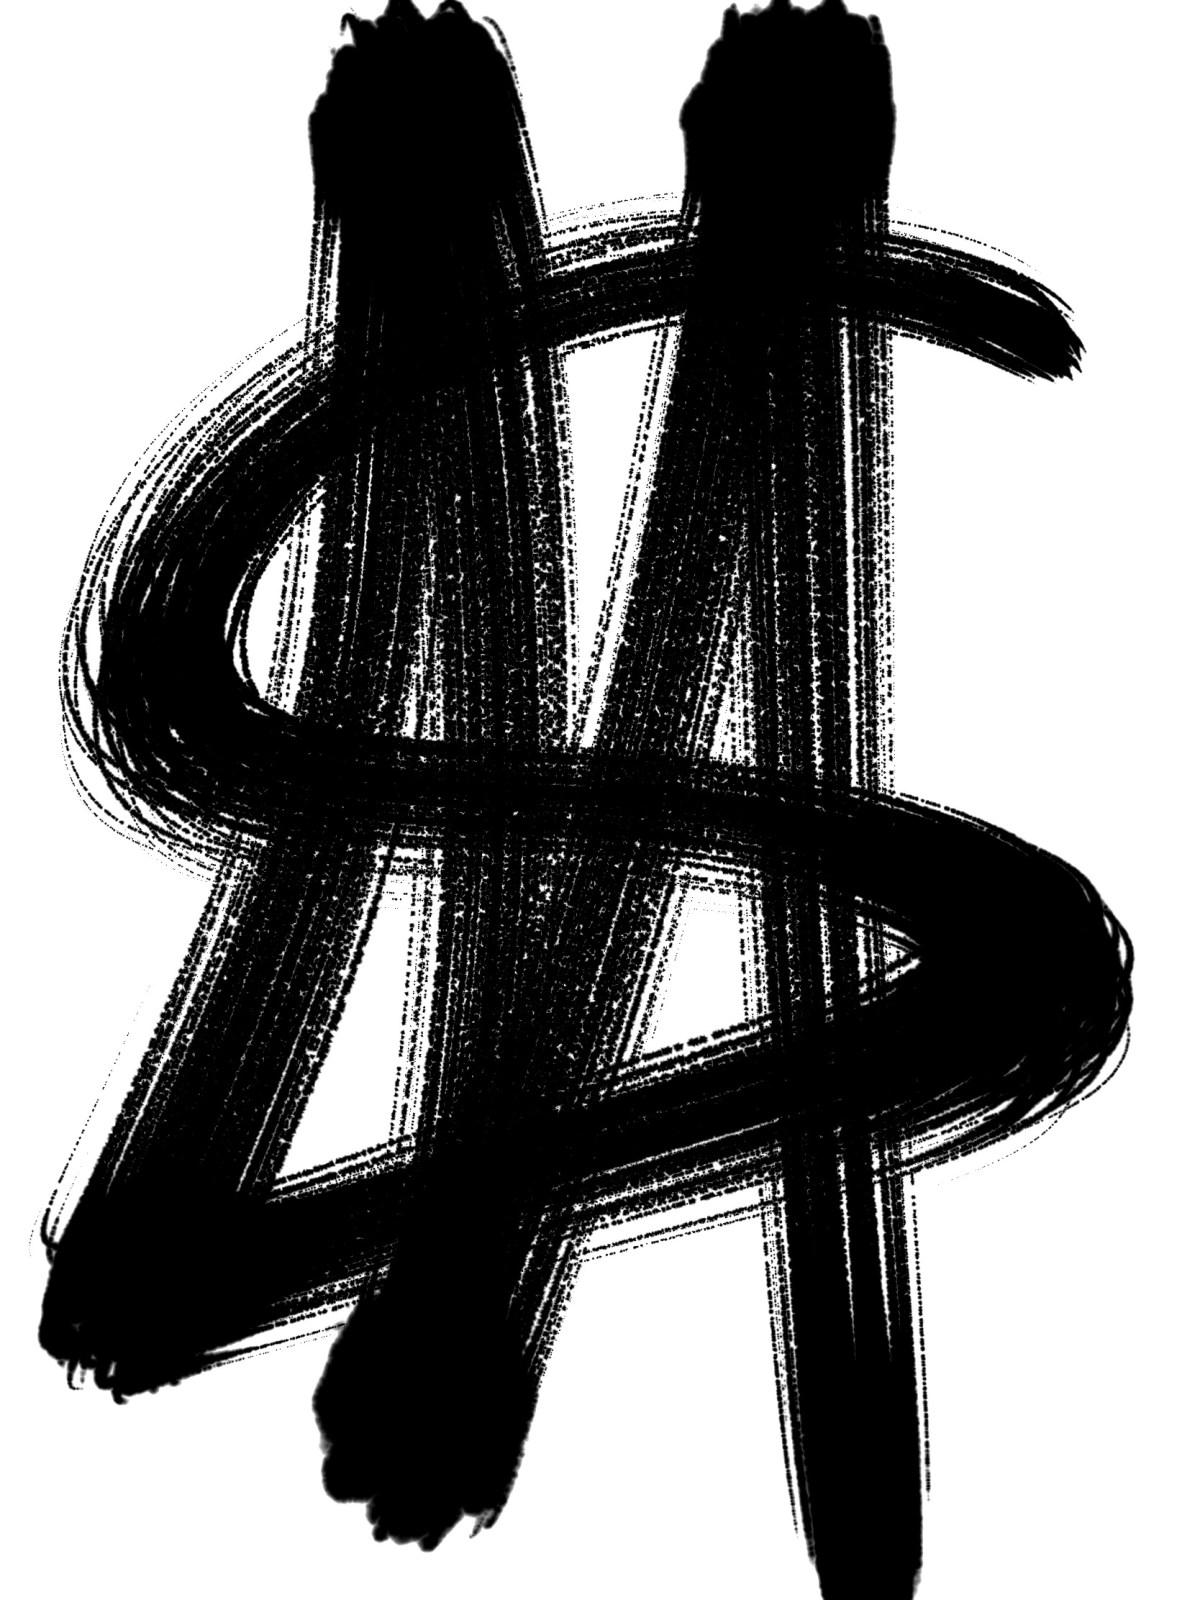 Money dollar sign abstract ERIC KIM